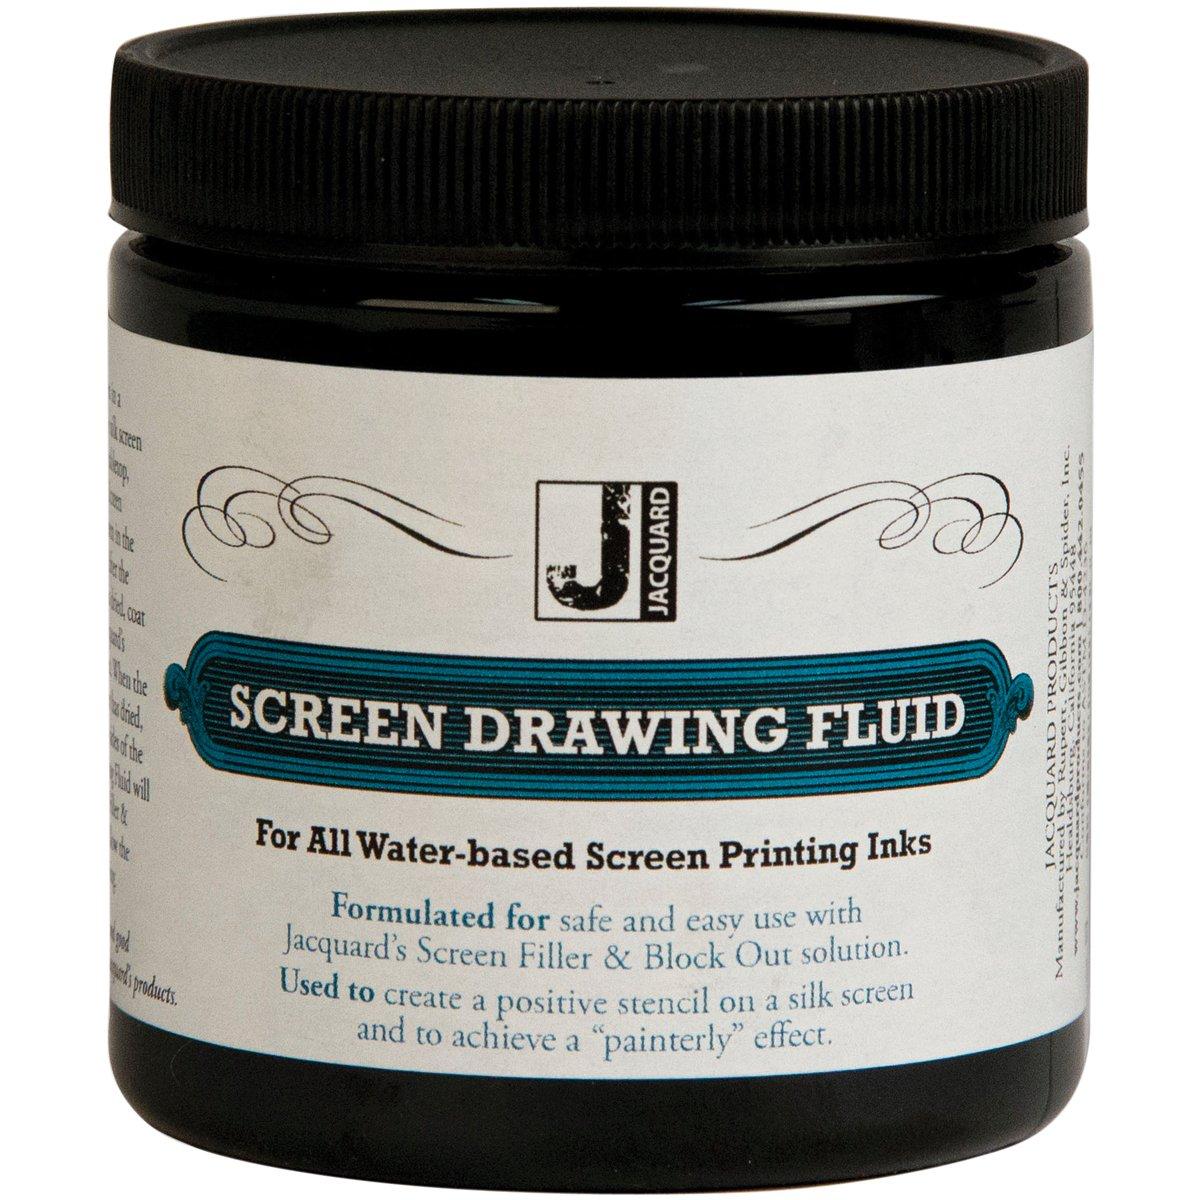 Jacquard Screen Printing Drawing Fluid 8 Ounces JACQUARD/R G S